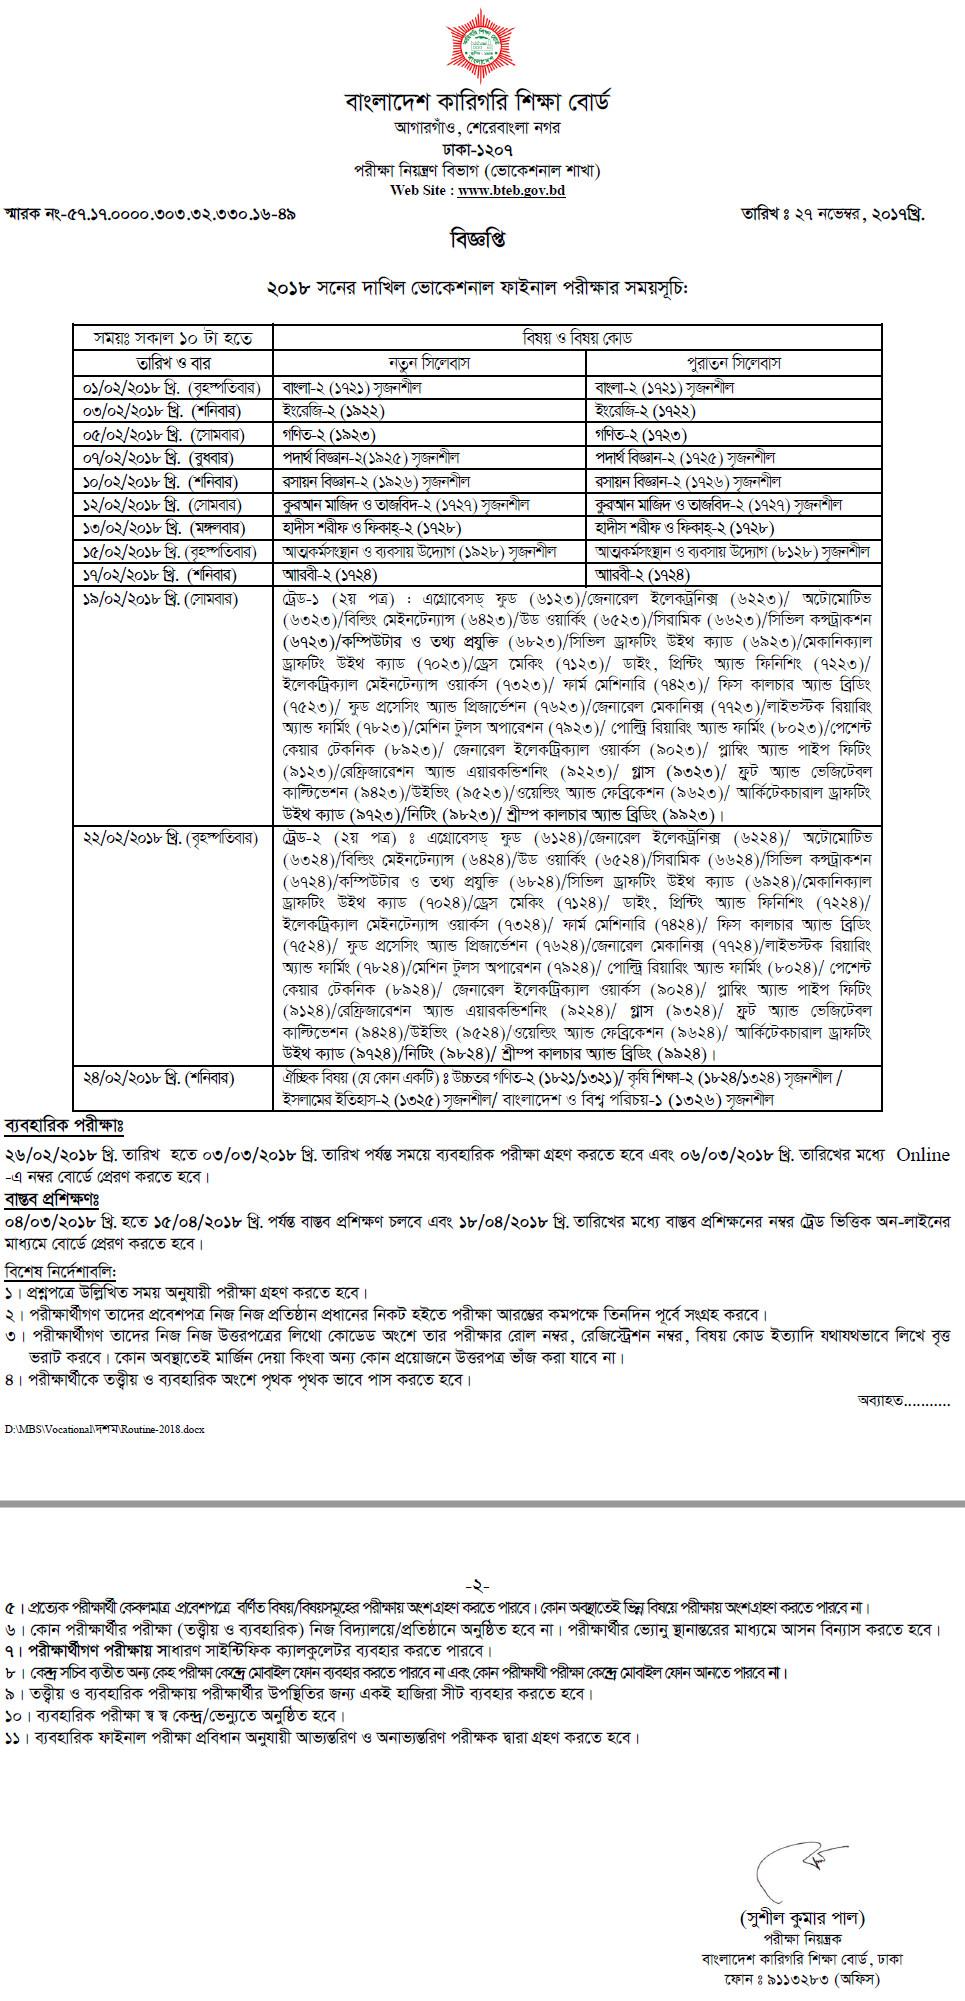 Dakhil Vocational Class 10 Exam Routine 2018 PDF File